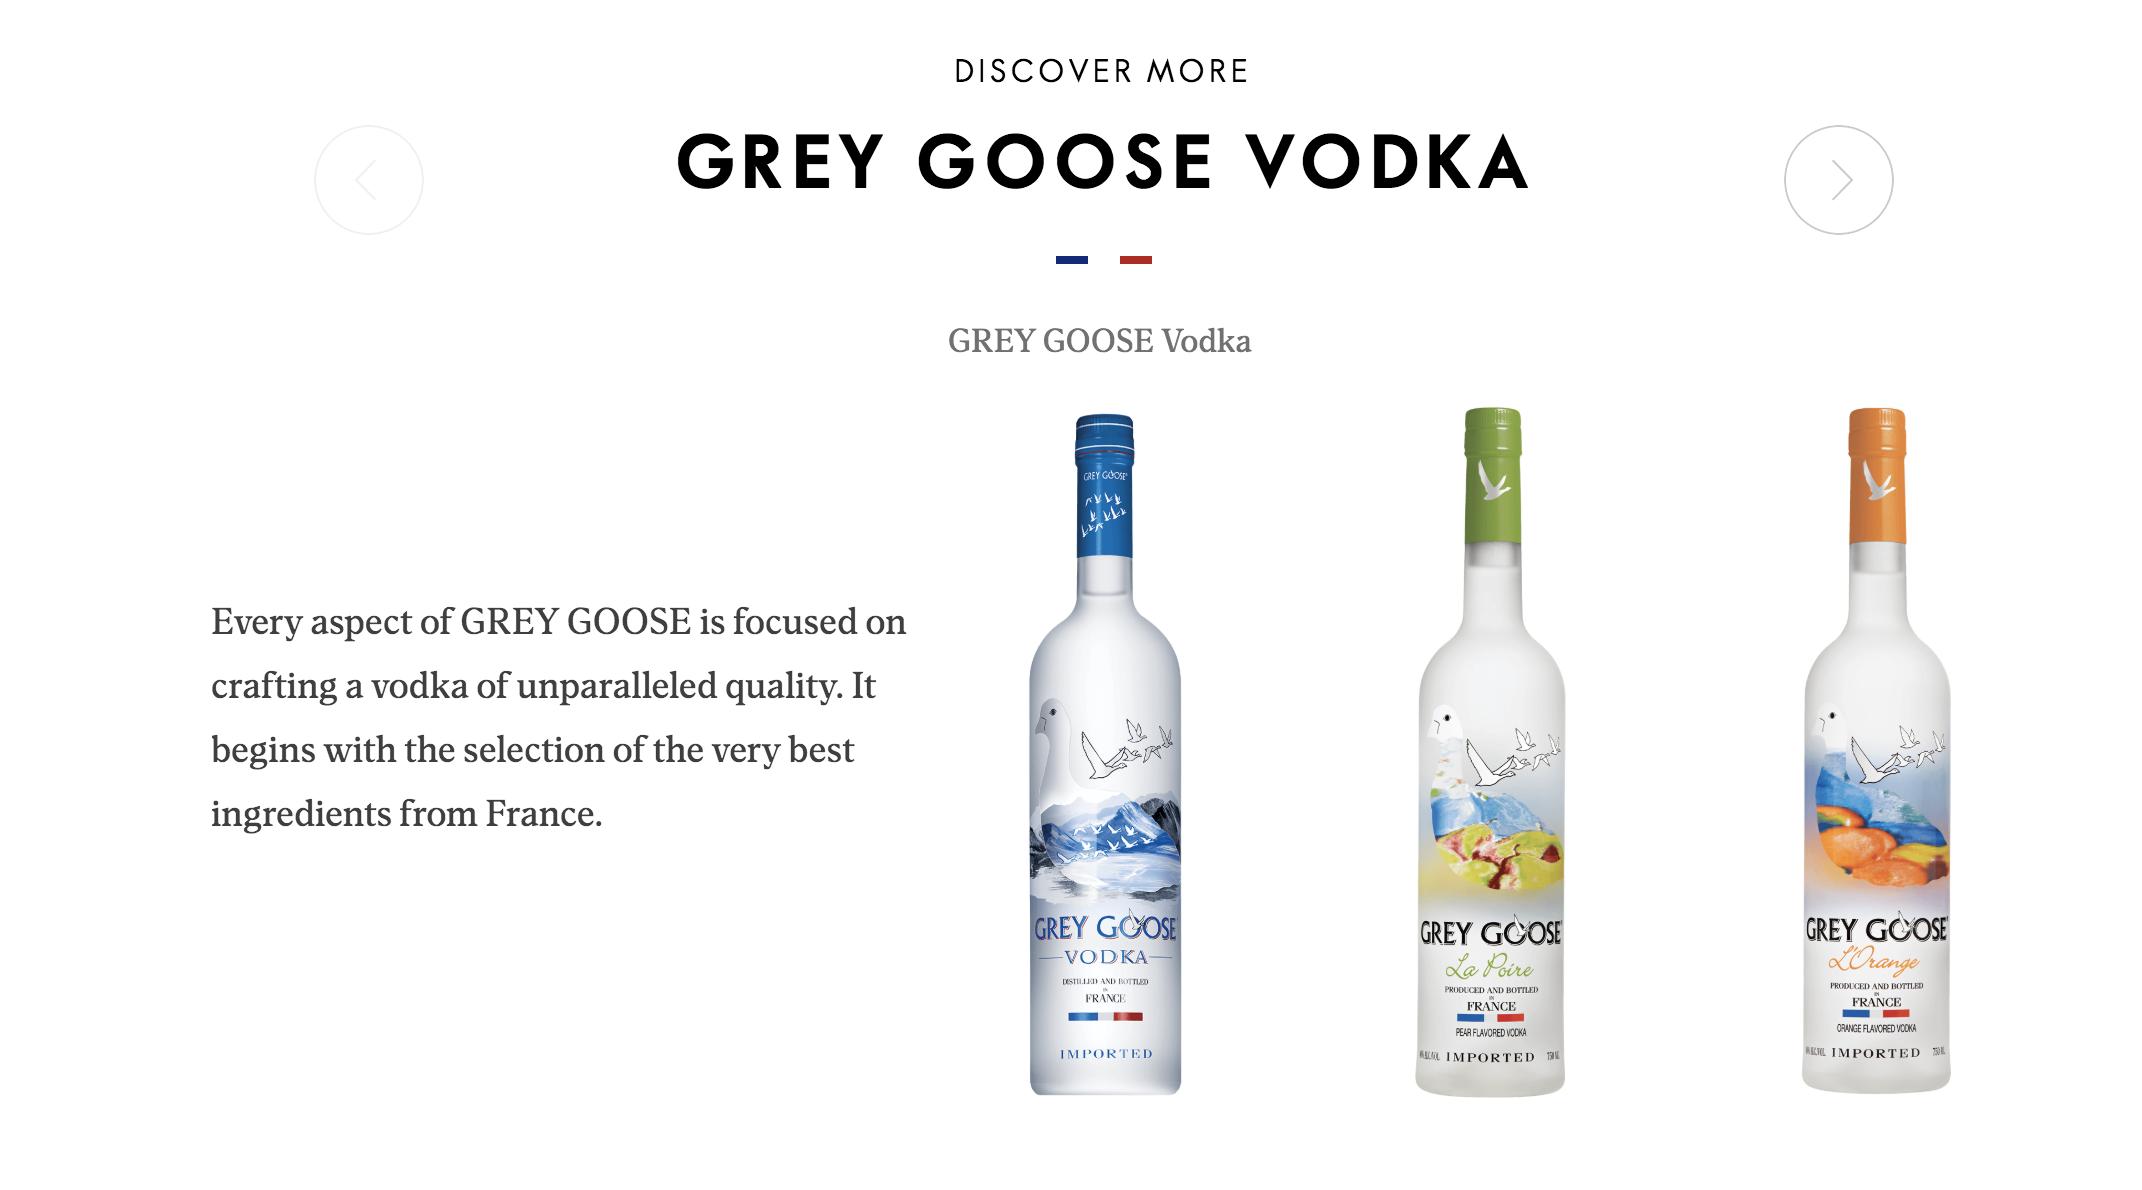 grey goose vodka flavors